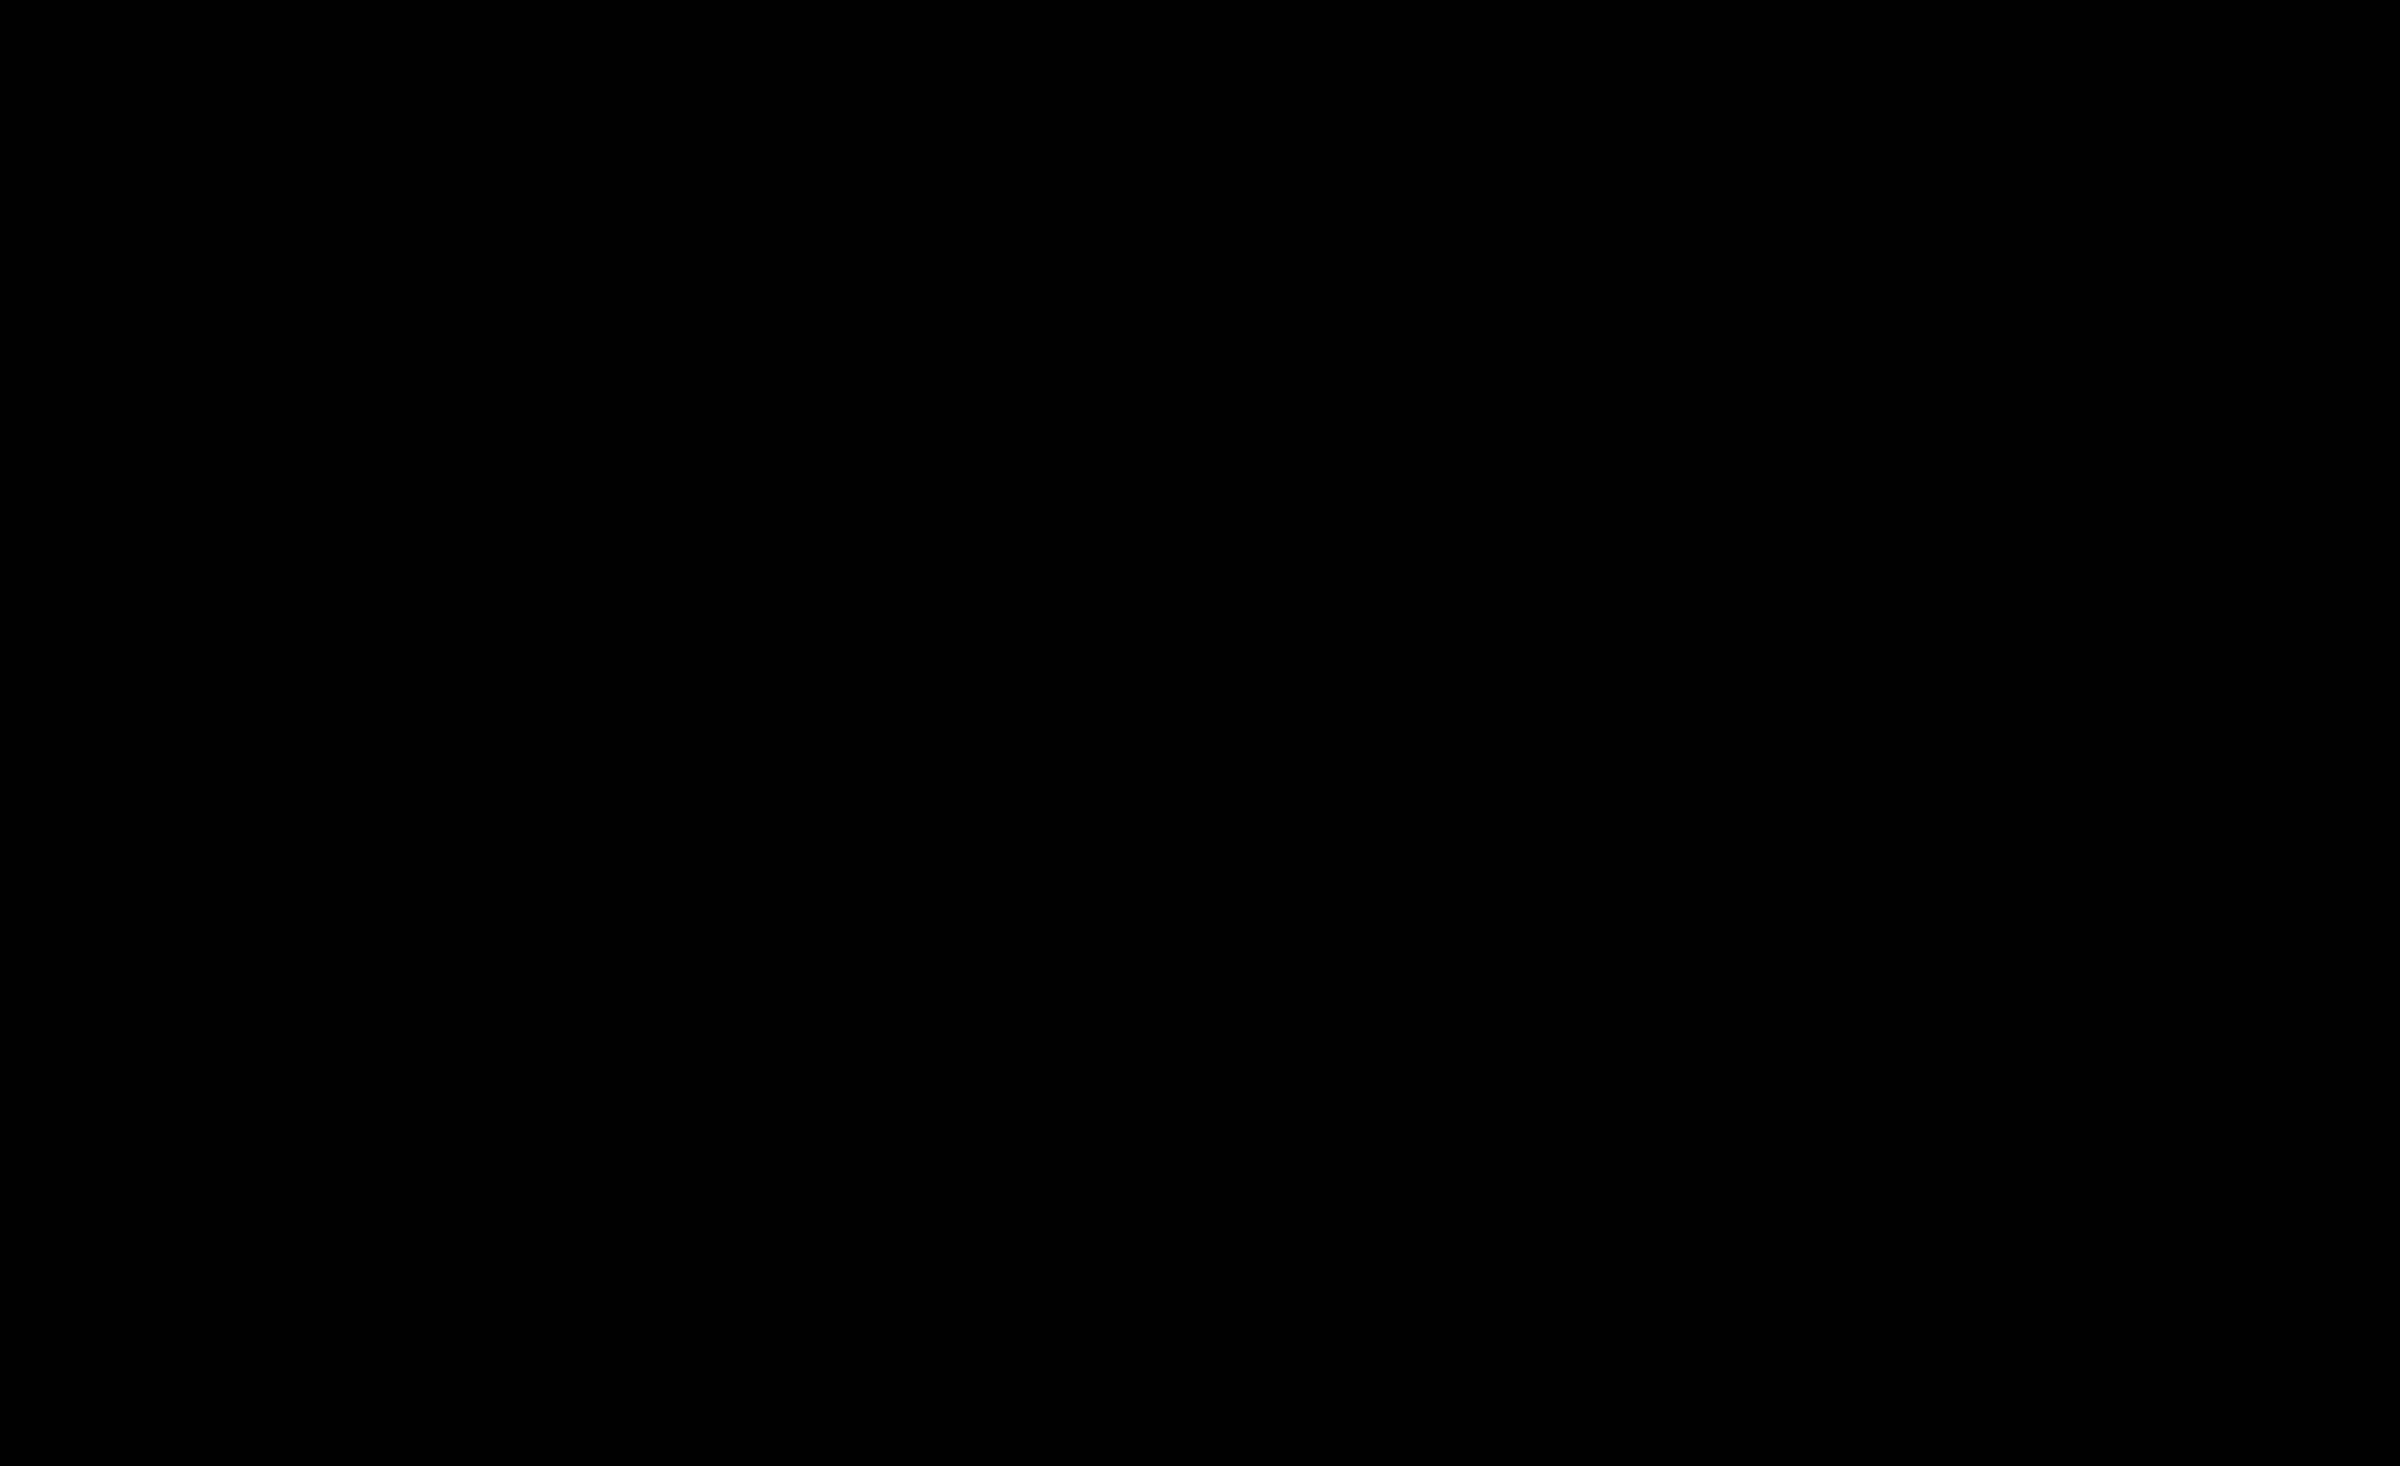 Clipart Dusseldorf Cityscape Silhouette